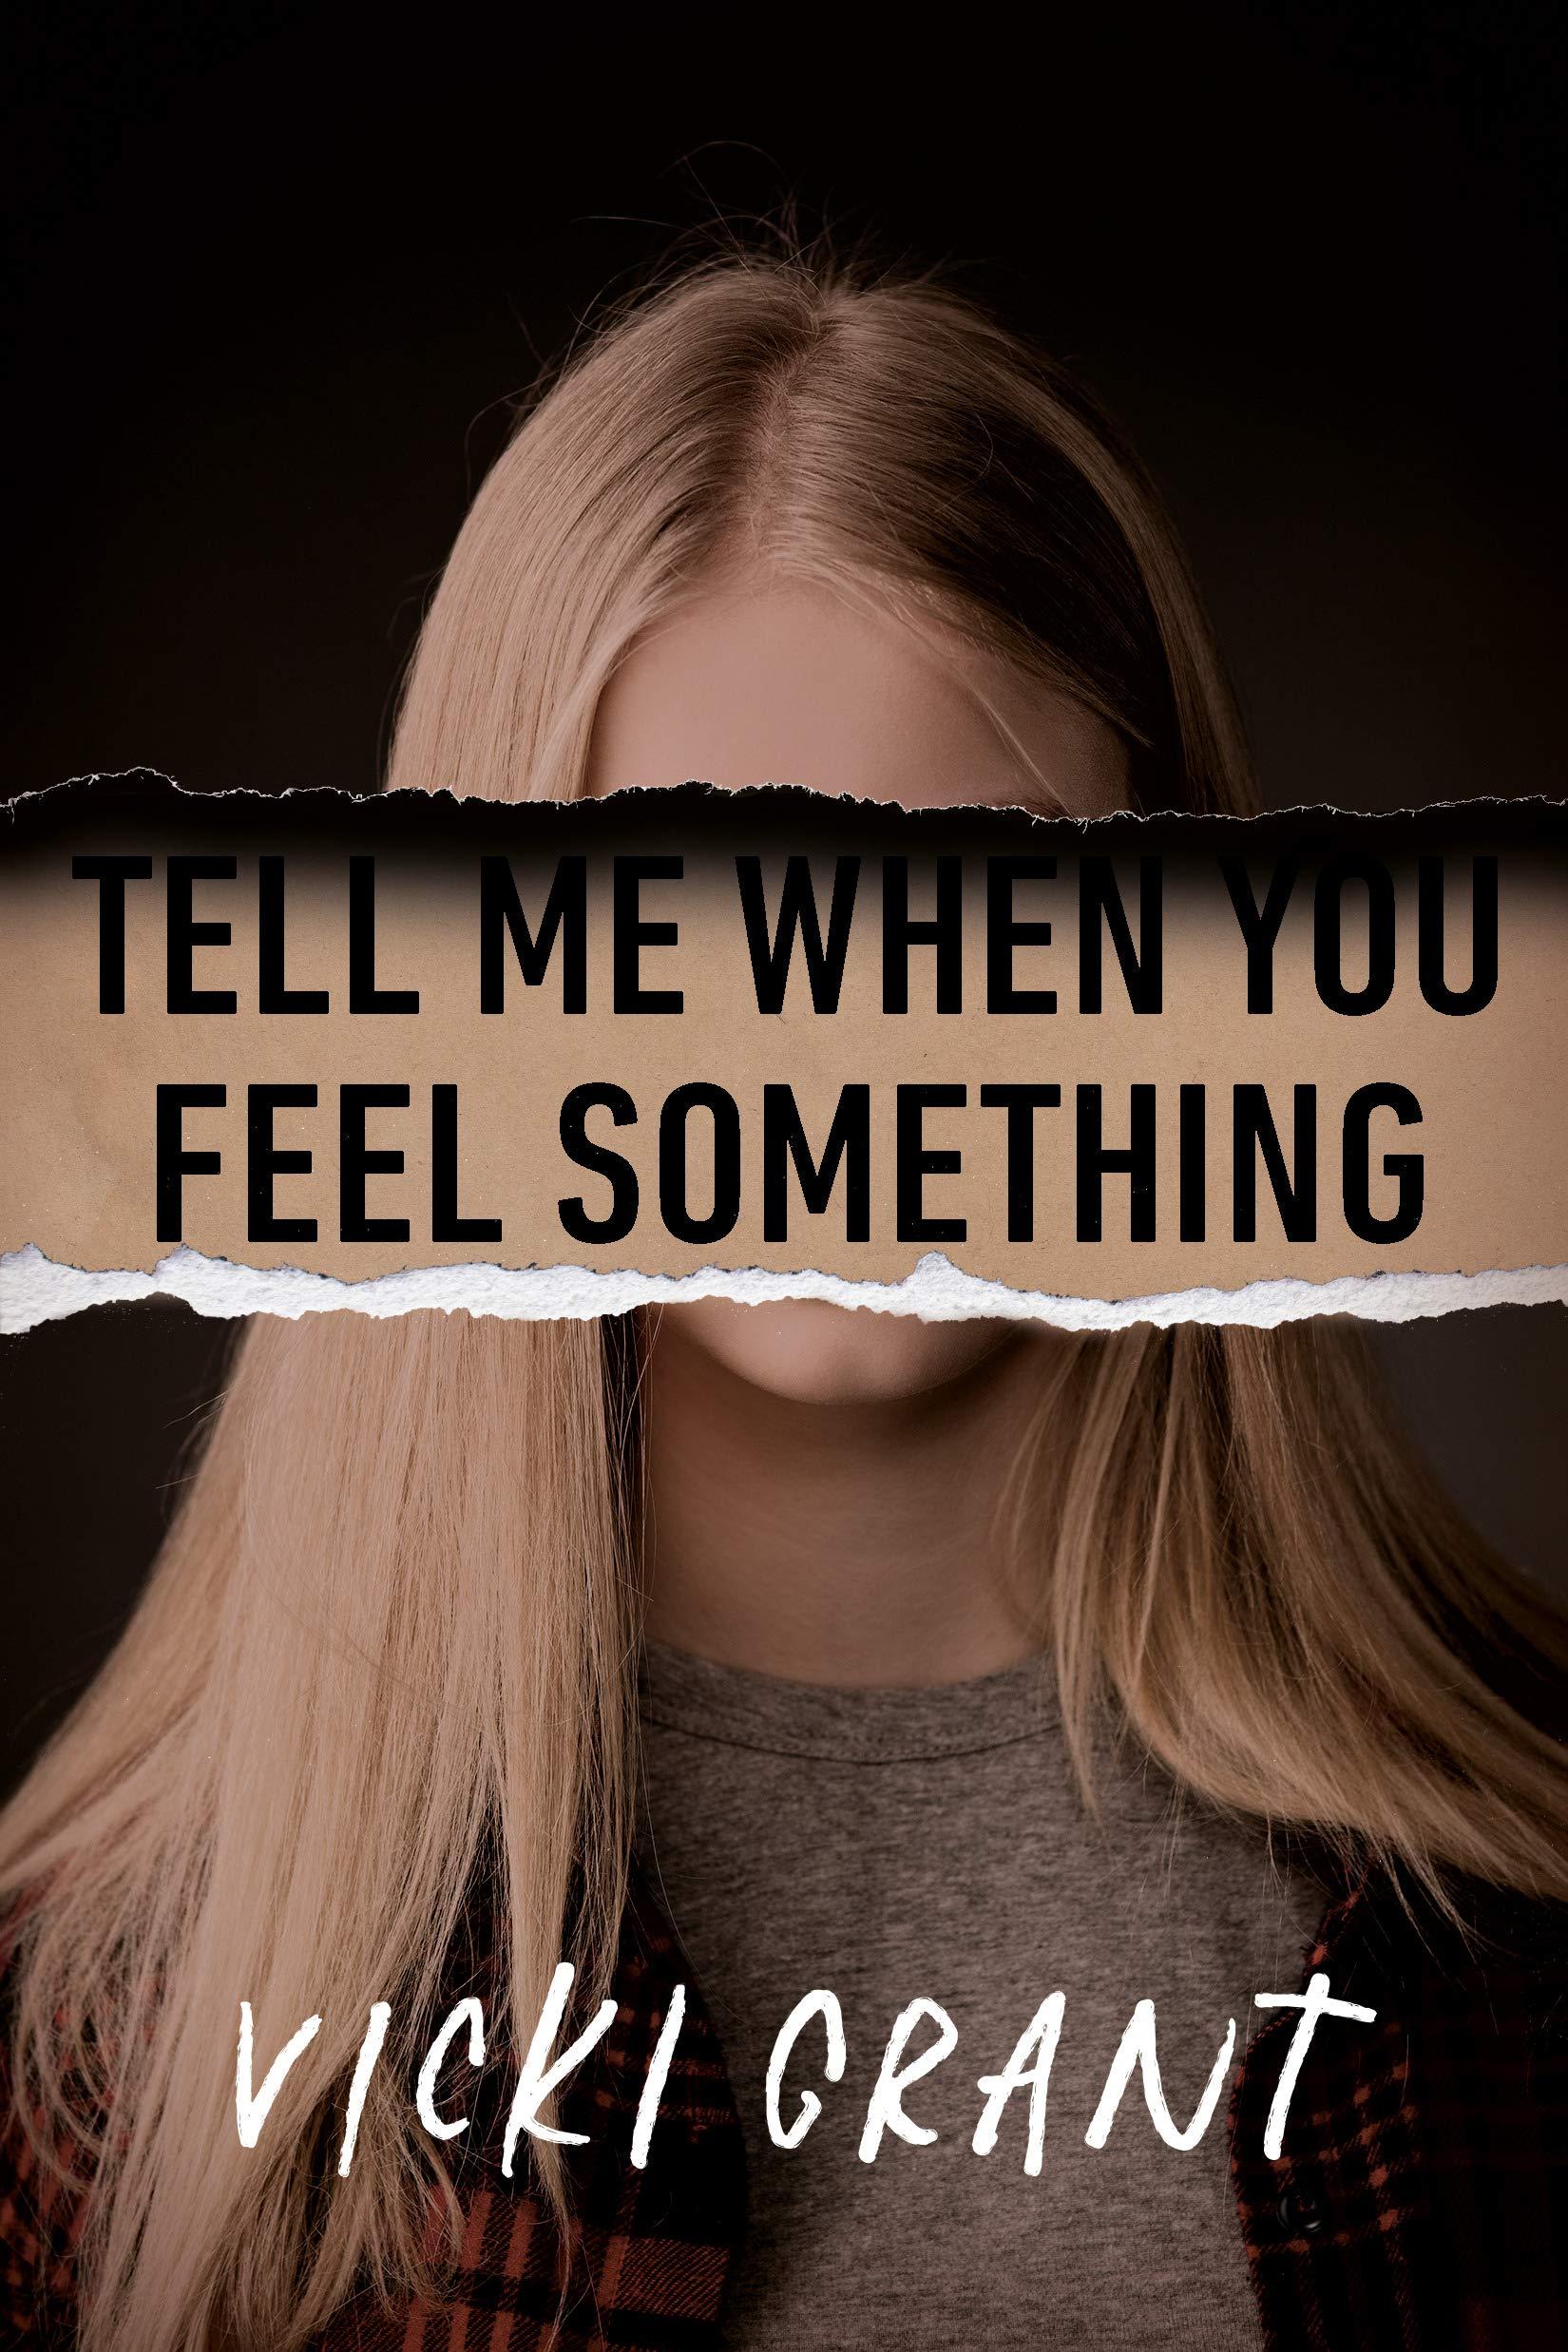 Amazon.com: Tell Me When You Feel Something (9780735270091): Grant, Vicki:  Books